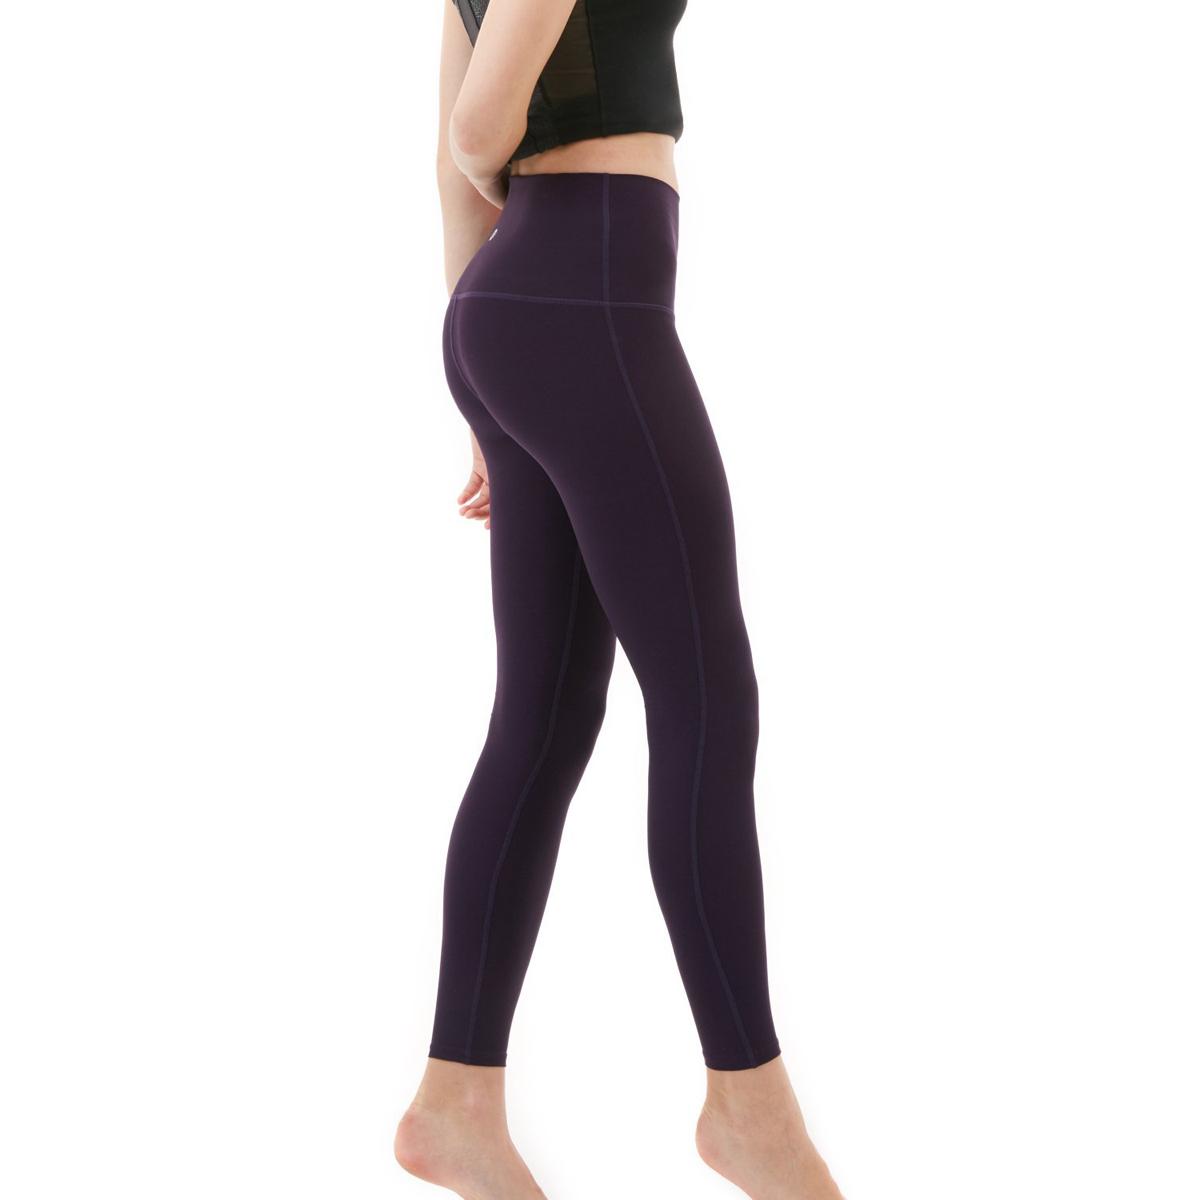 thumbnail 33 - TSLA Tesla FYP42 Women's High-Waisted Ultra-Stretch Tummy Control Yoga Pants